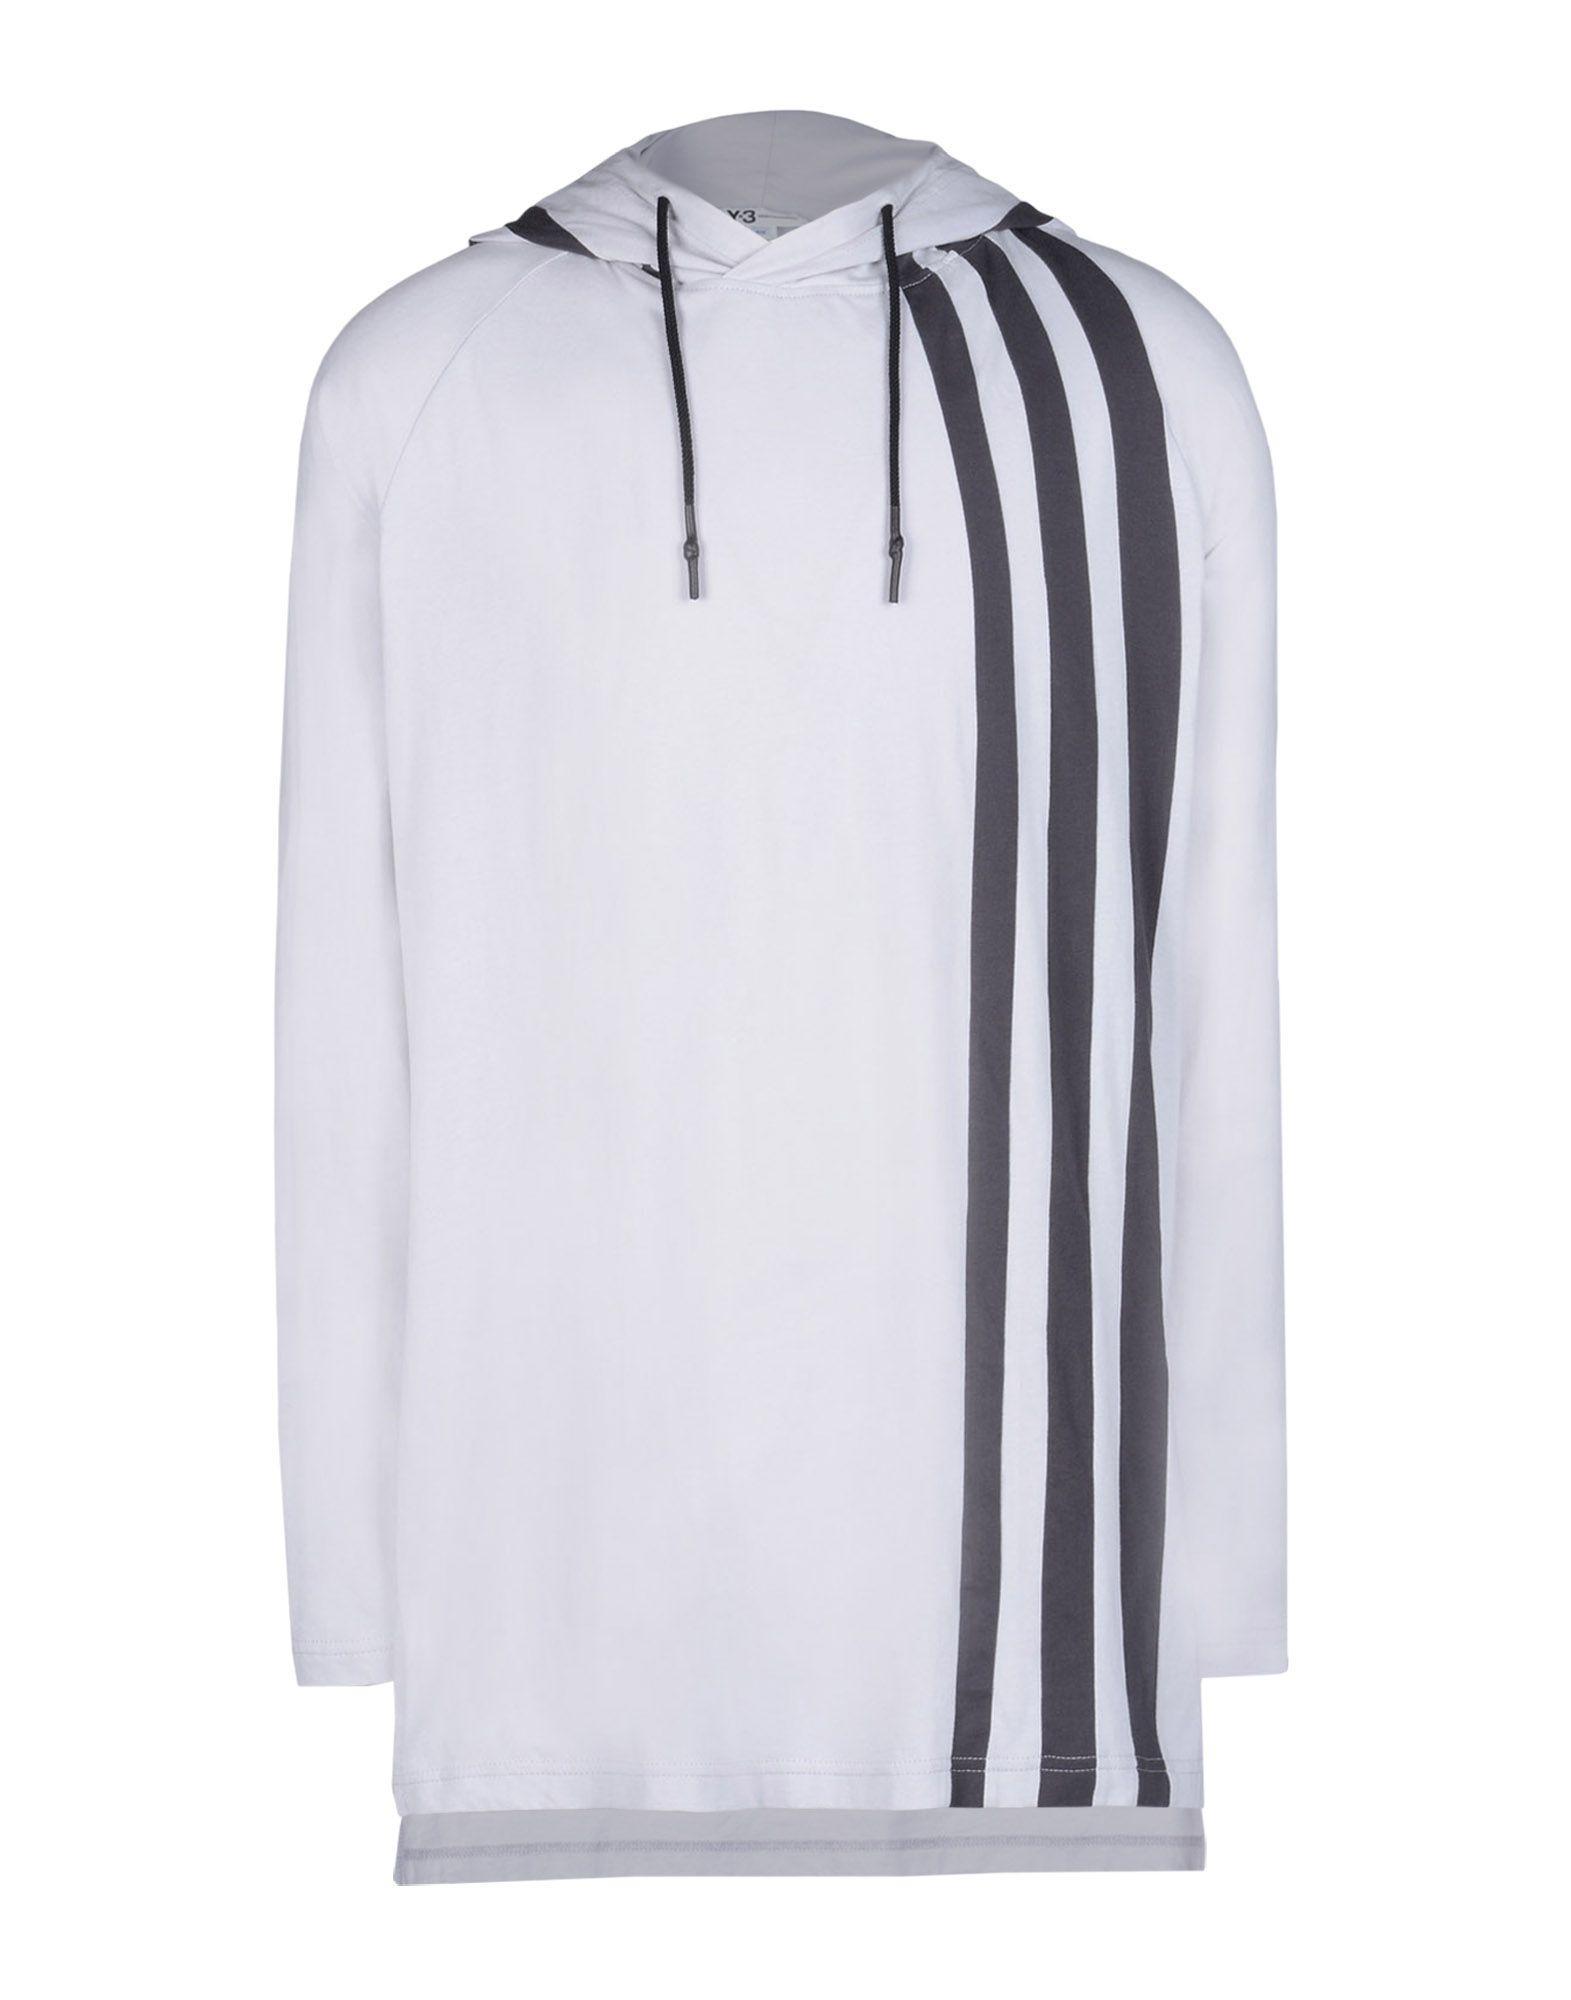 31d4a8d0d2aae Lyst - Y-3 3-stripes Hoodie in Gray for Men